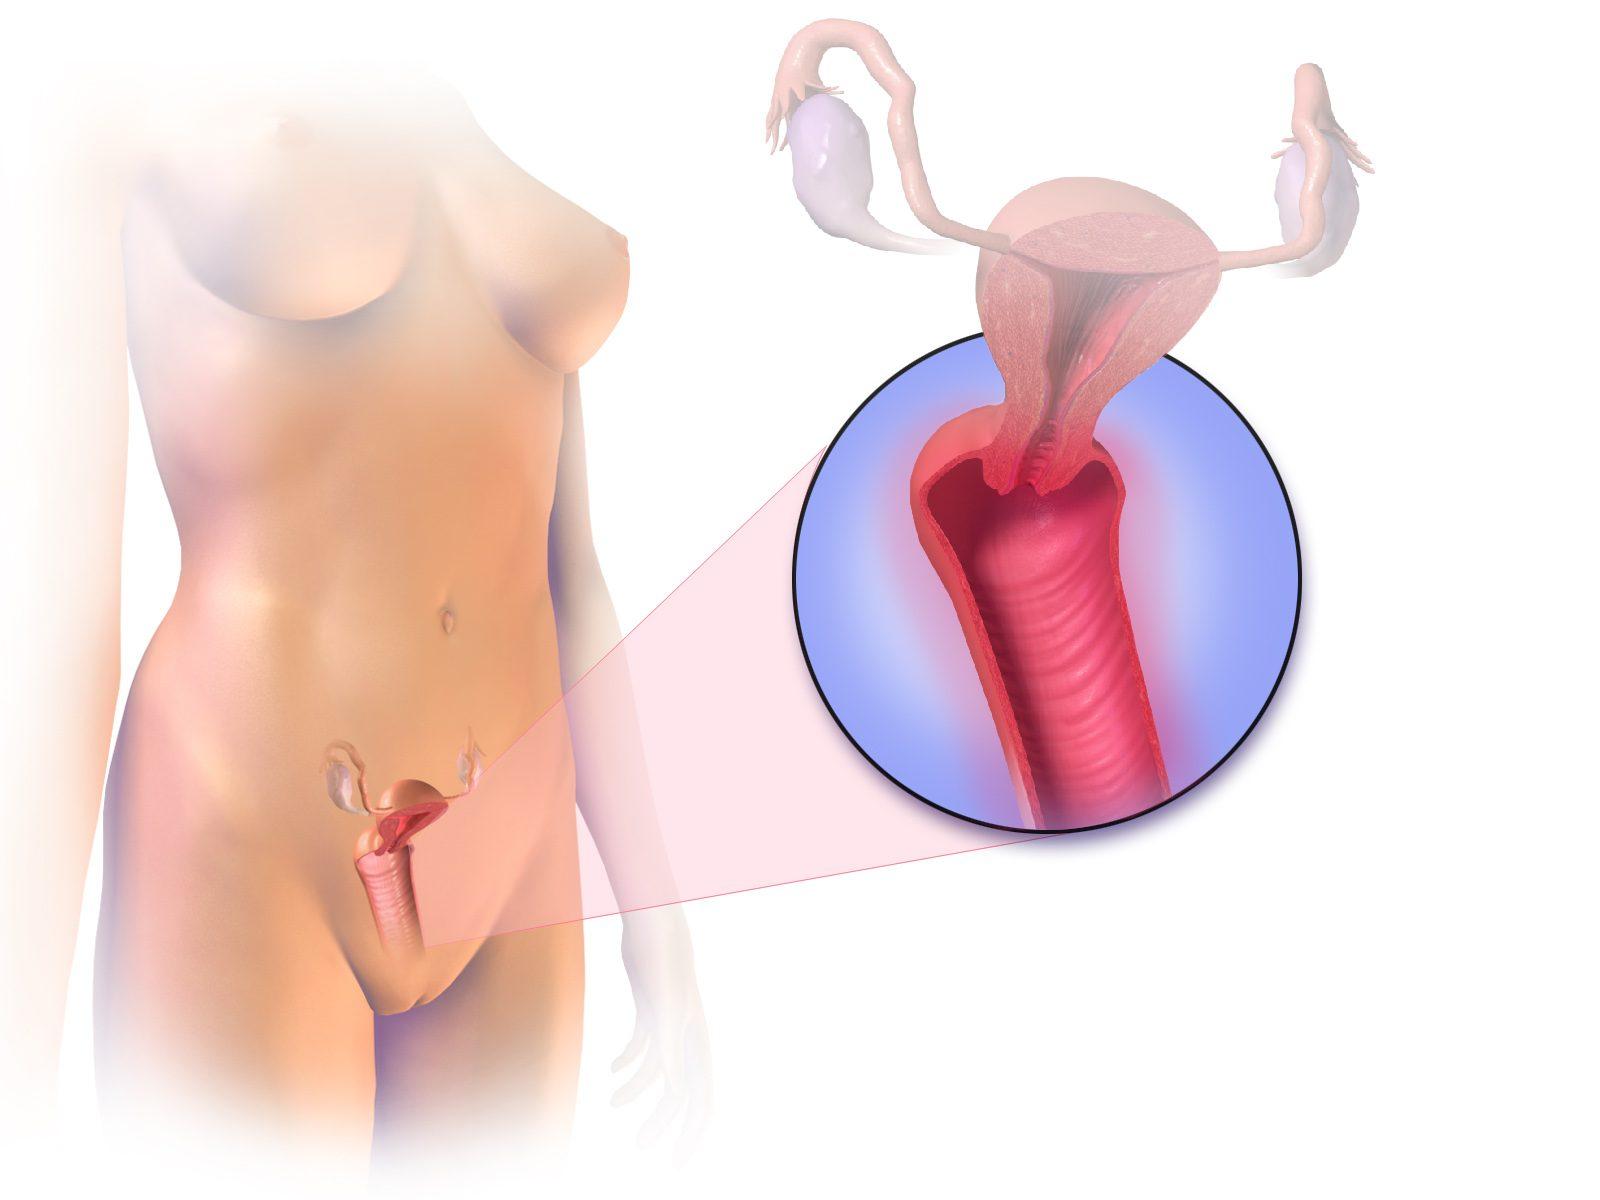 Vaginitis treatments